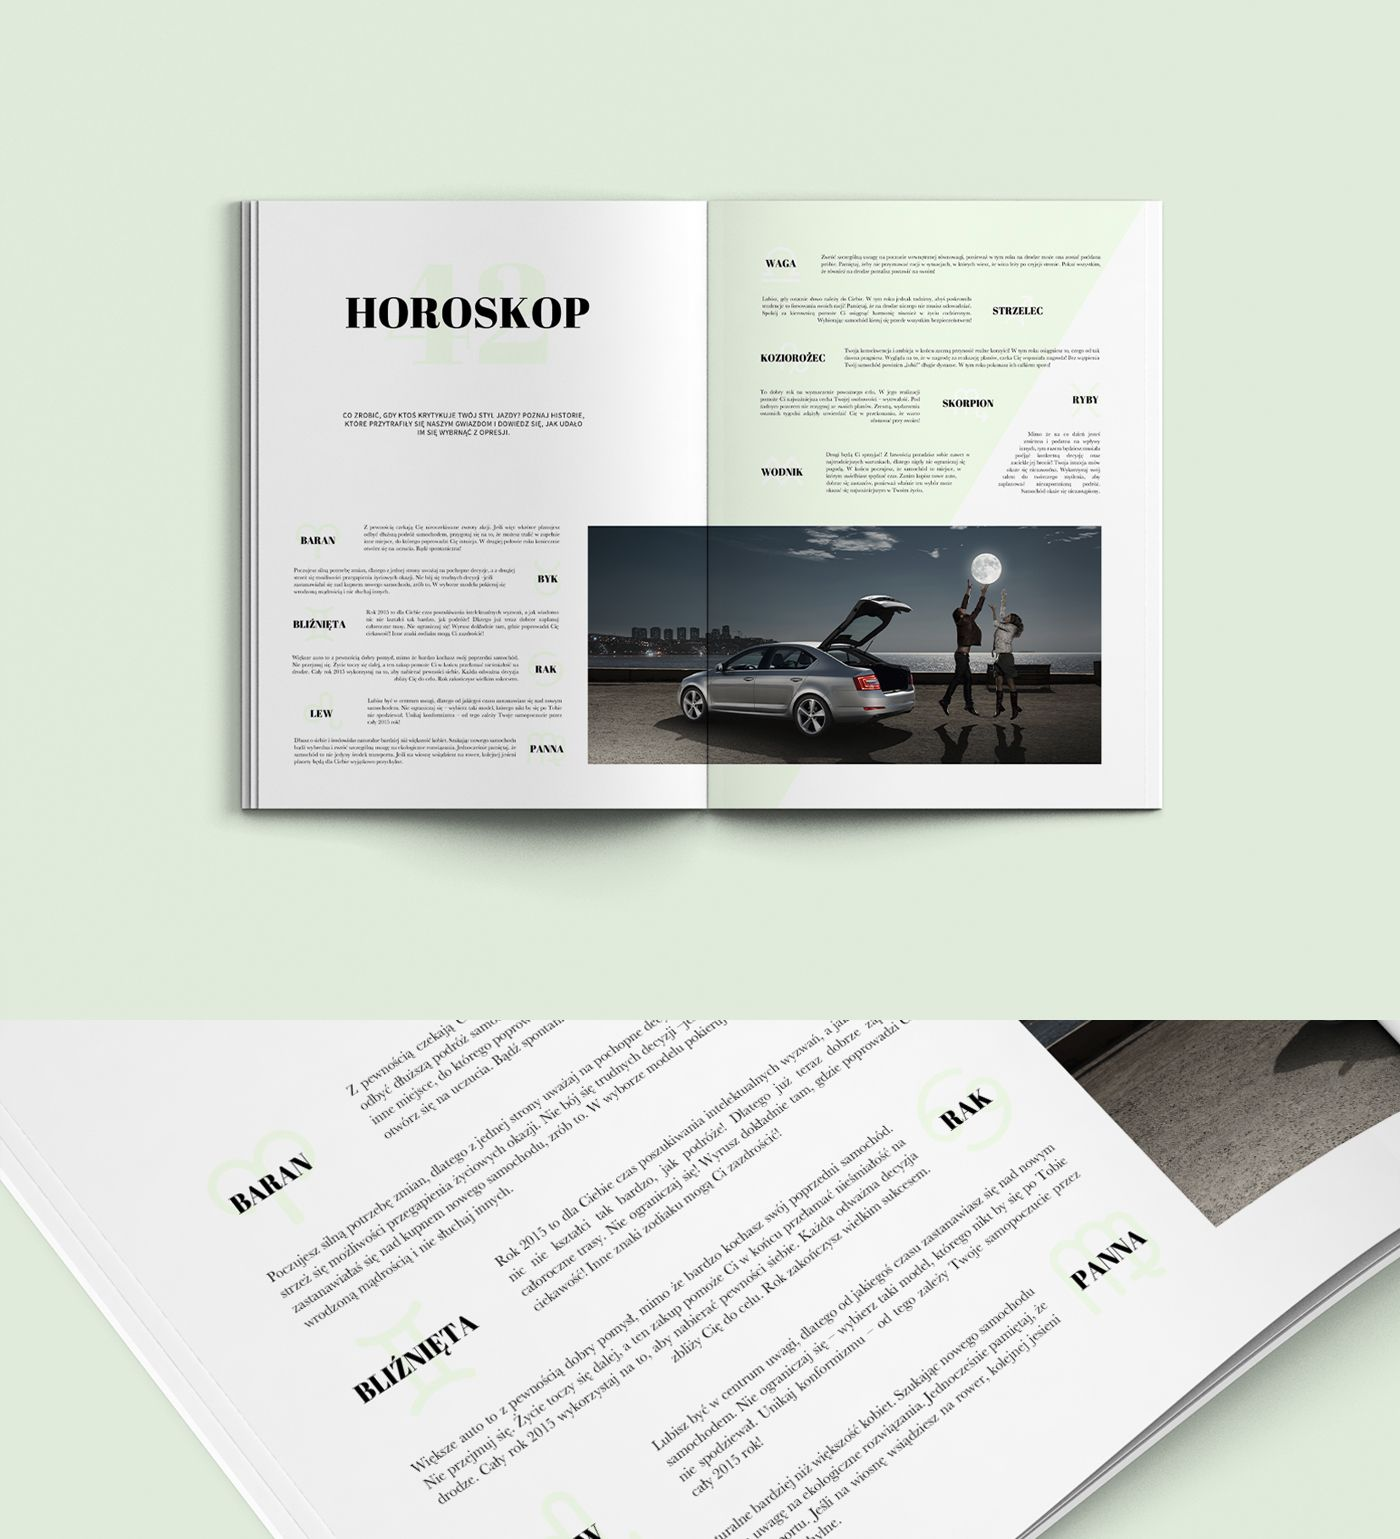 Road Magazine - Graphic Design - Editorial Design, Magazine Spread, Women, Cars, Driving, Clean, Plentiful Whitespace, Typographic